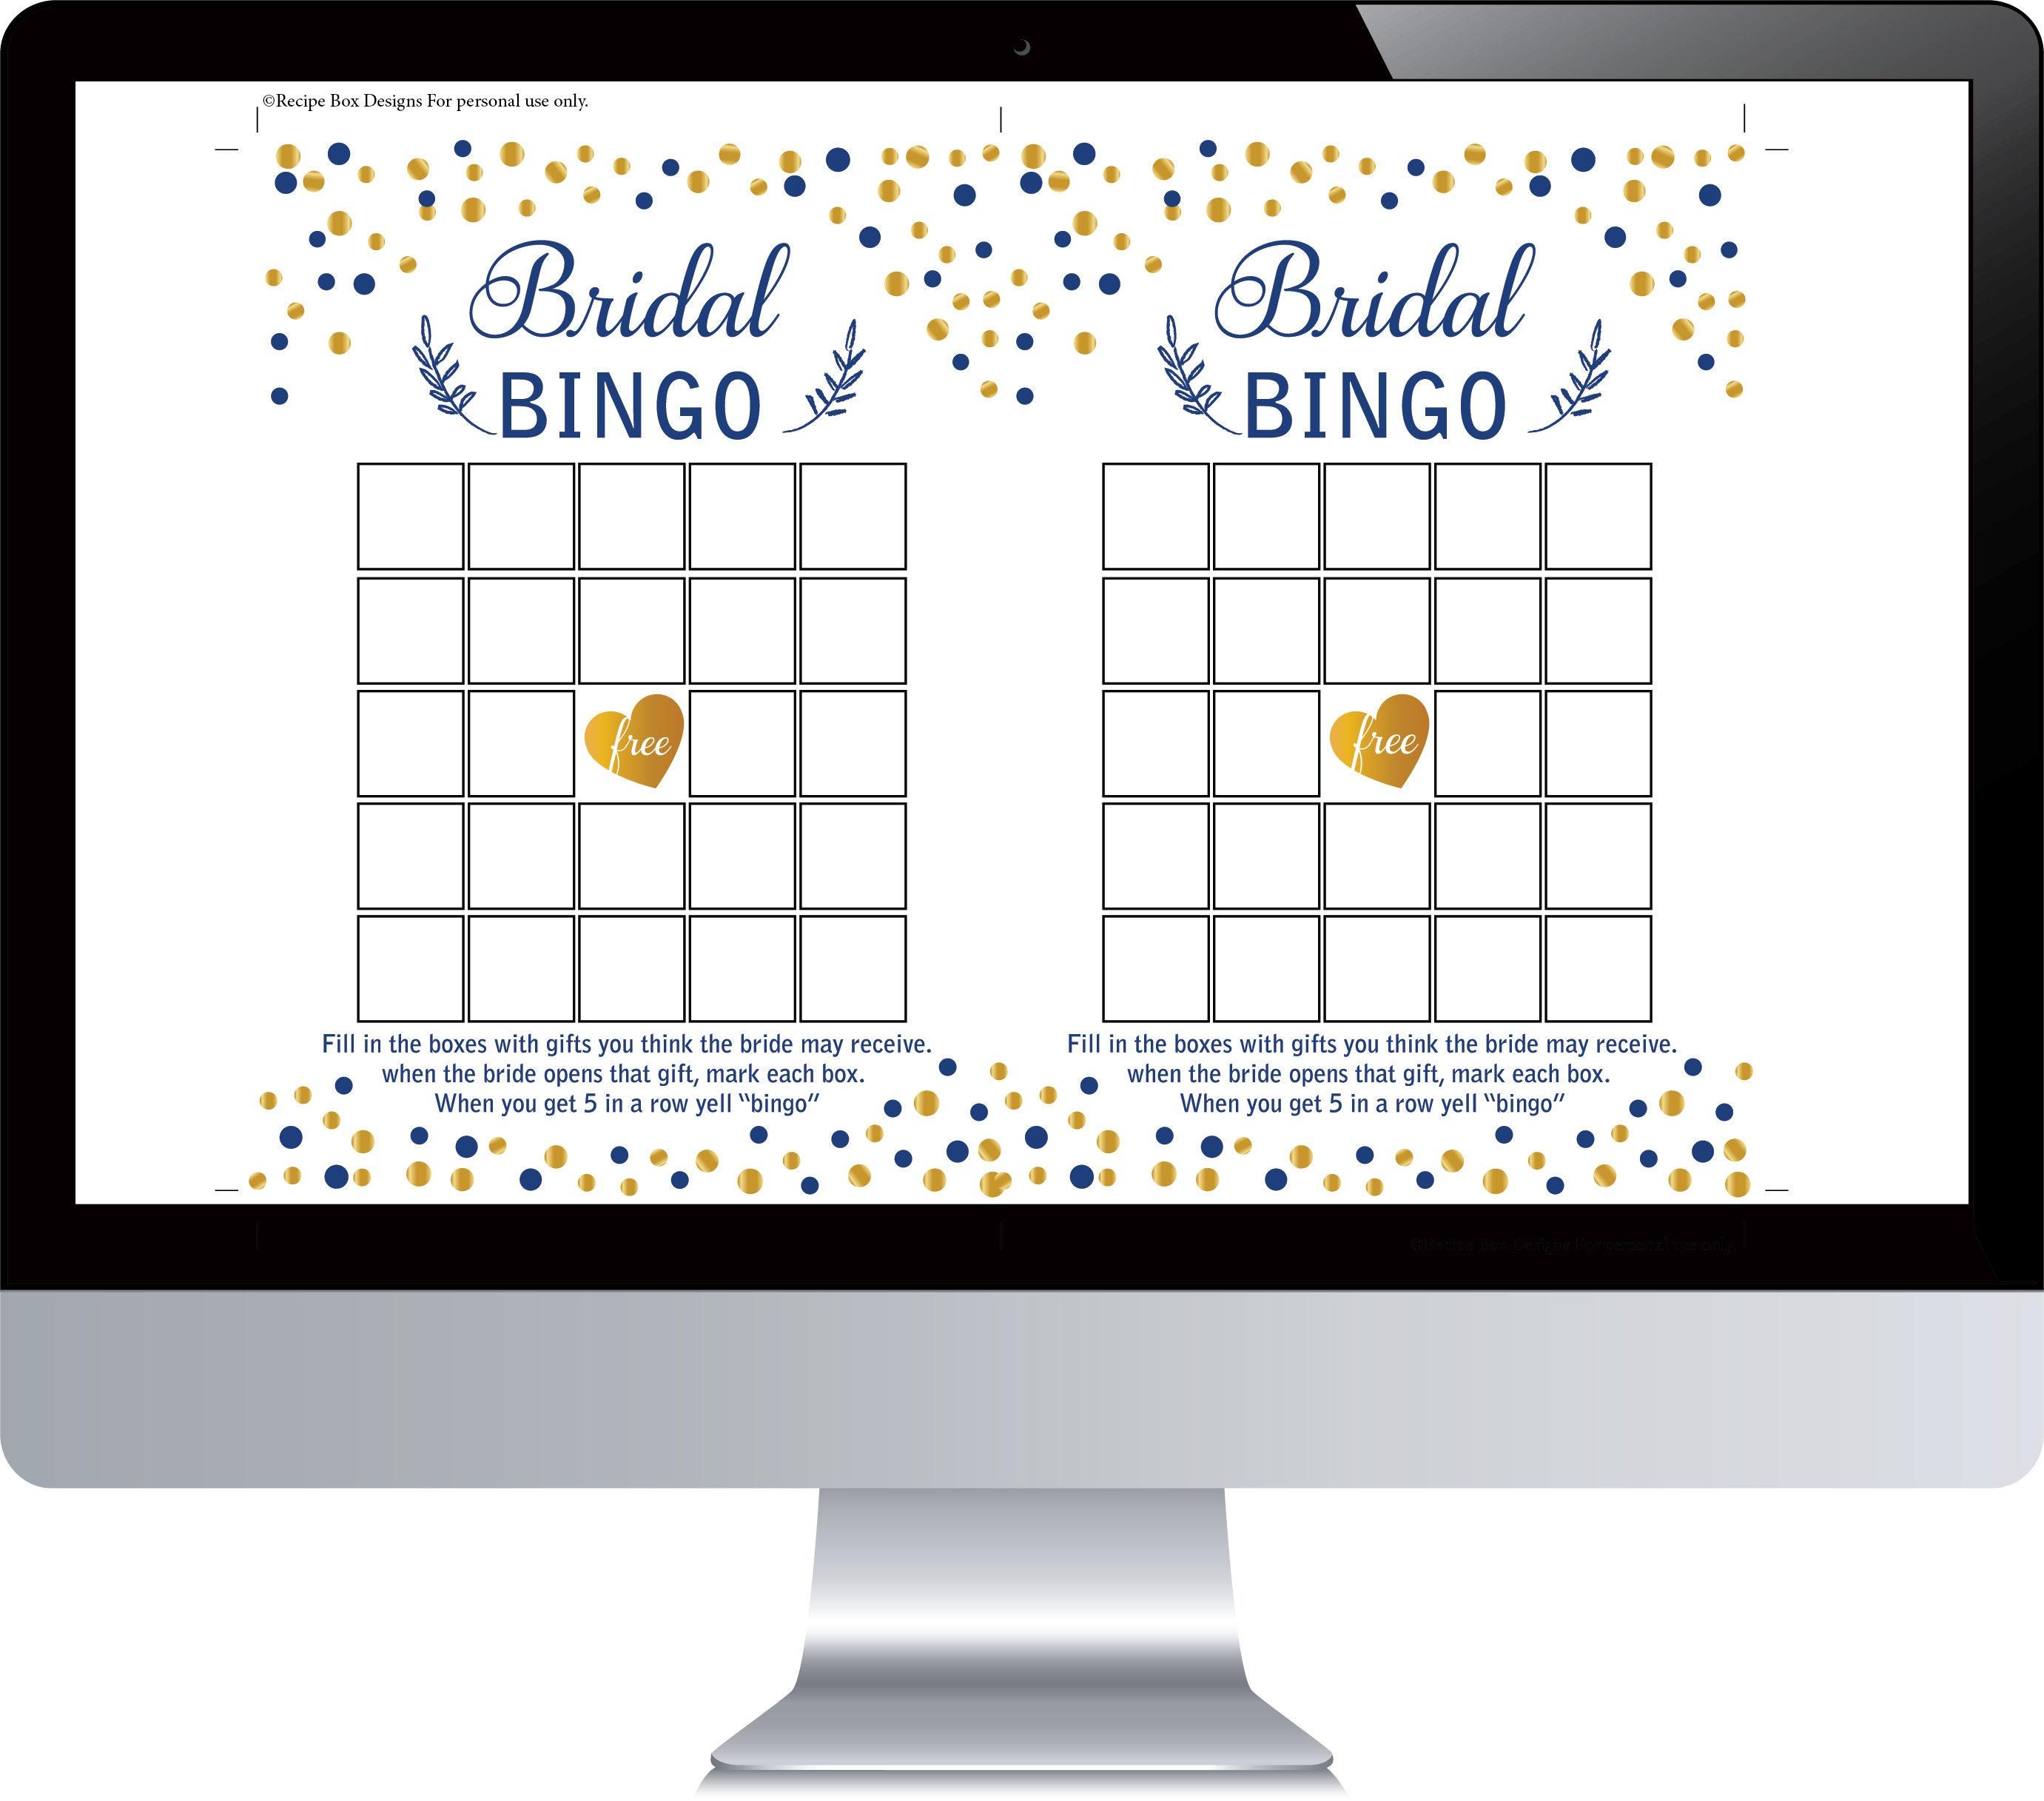 Bridal Bingo Template | Bridal Shower Bingo Printable Bridal Shower Games Bingo Printable